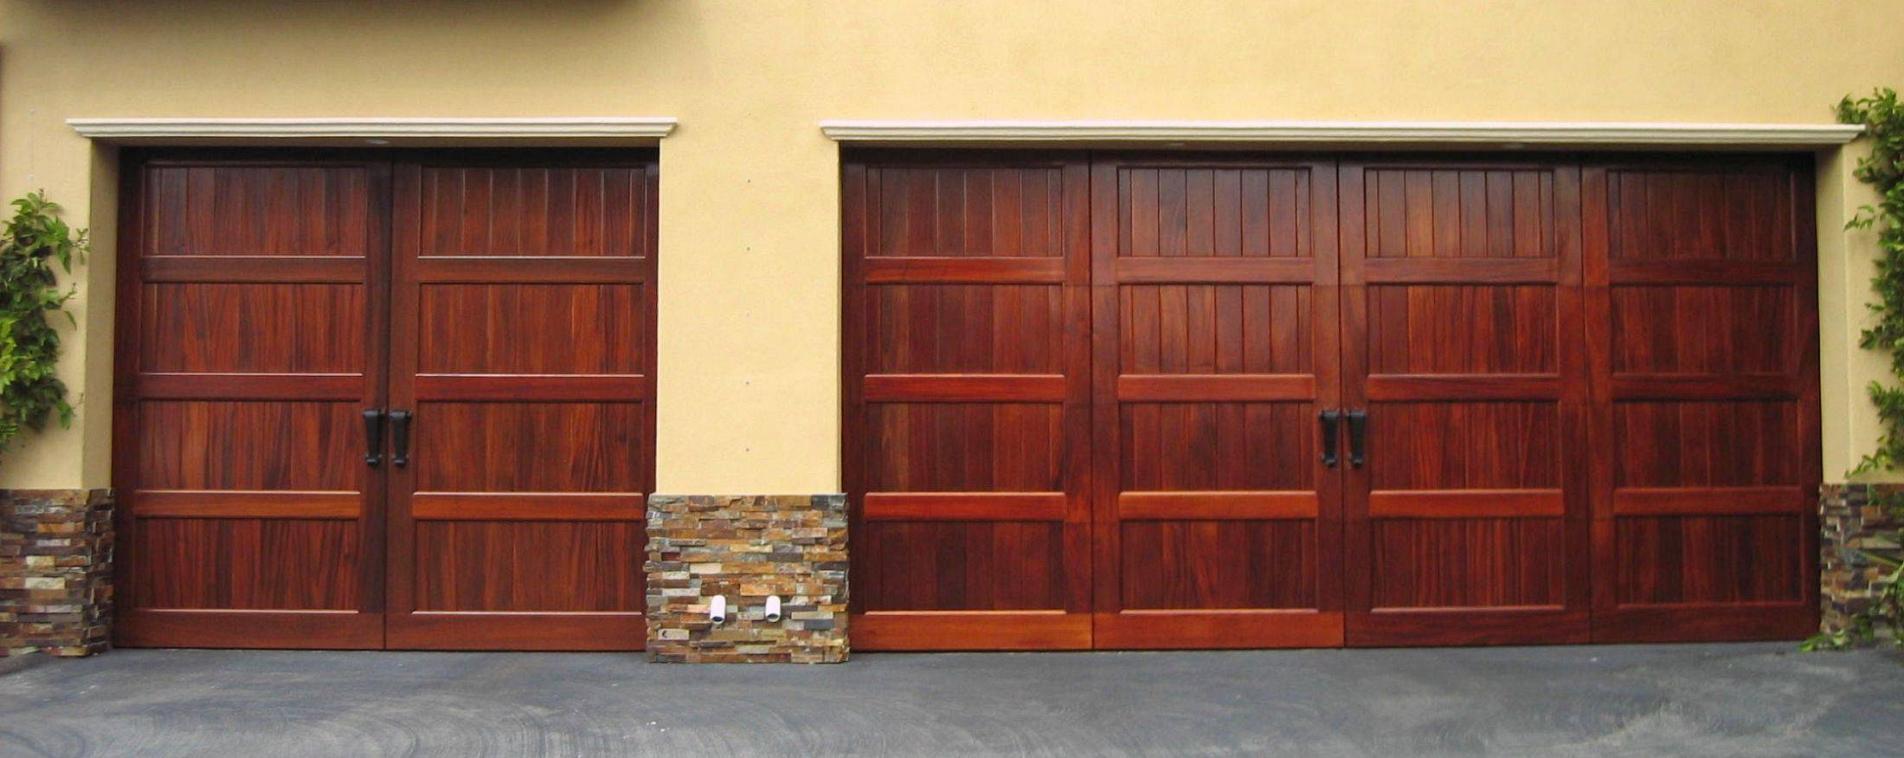 Awesome Garage Door Repair S All American Doors Miami Fl